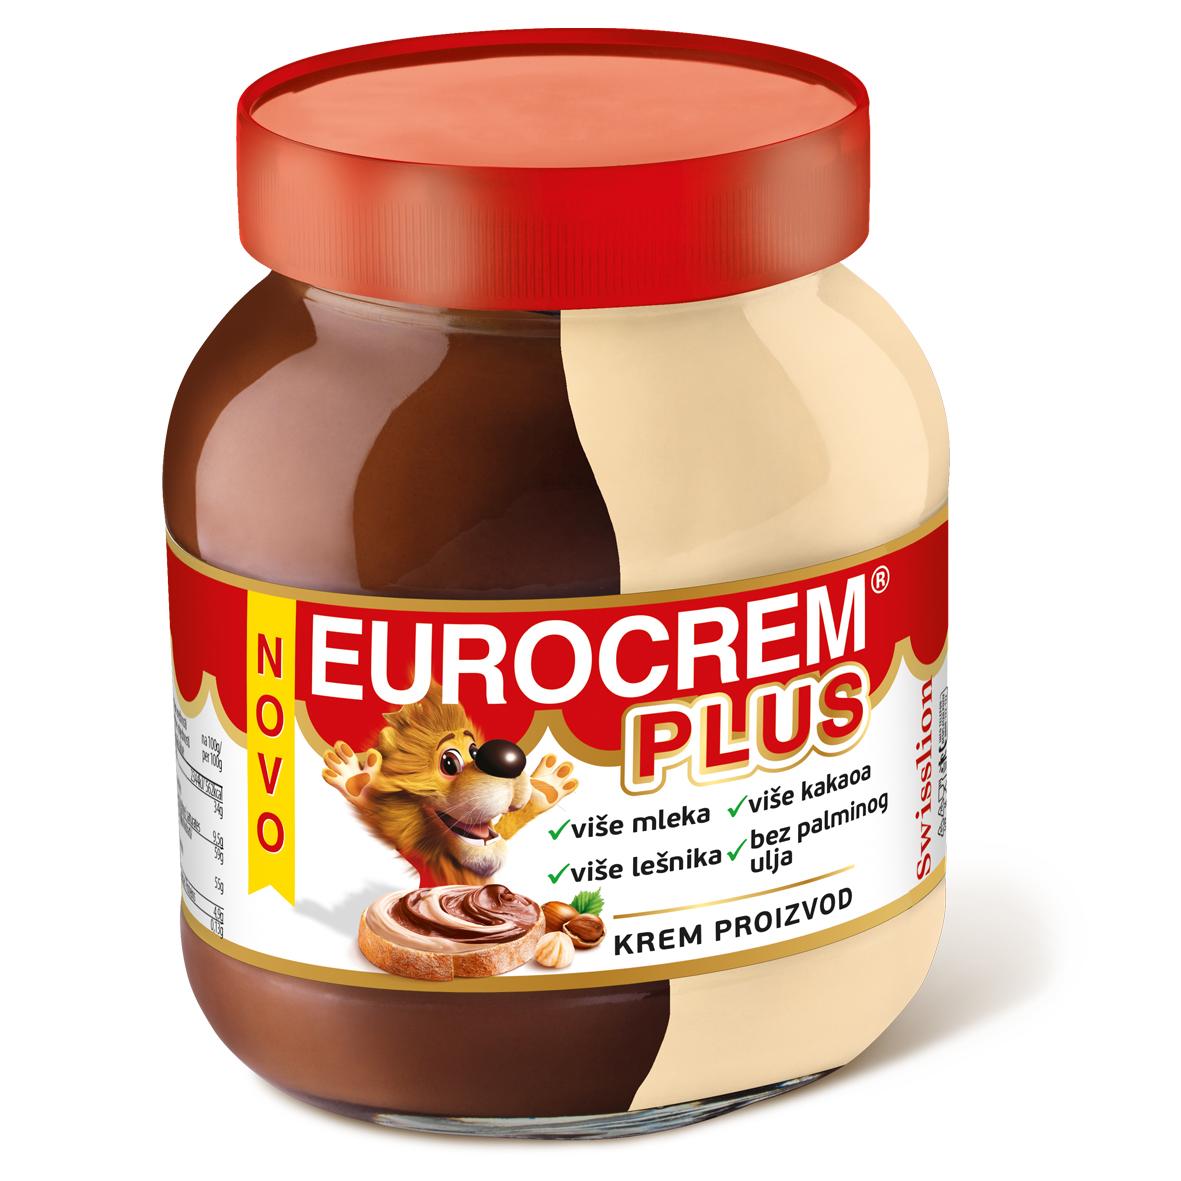 Eurocrem PLUS 700g